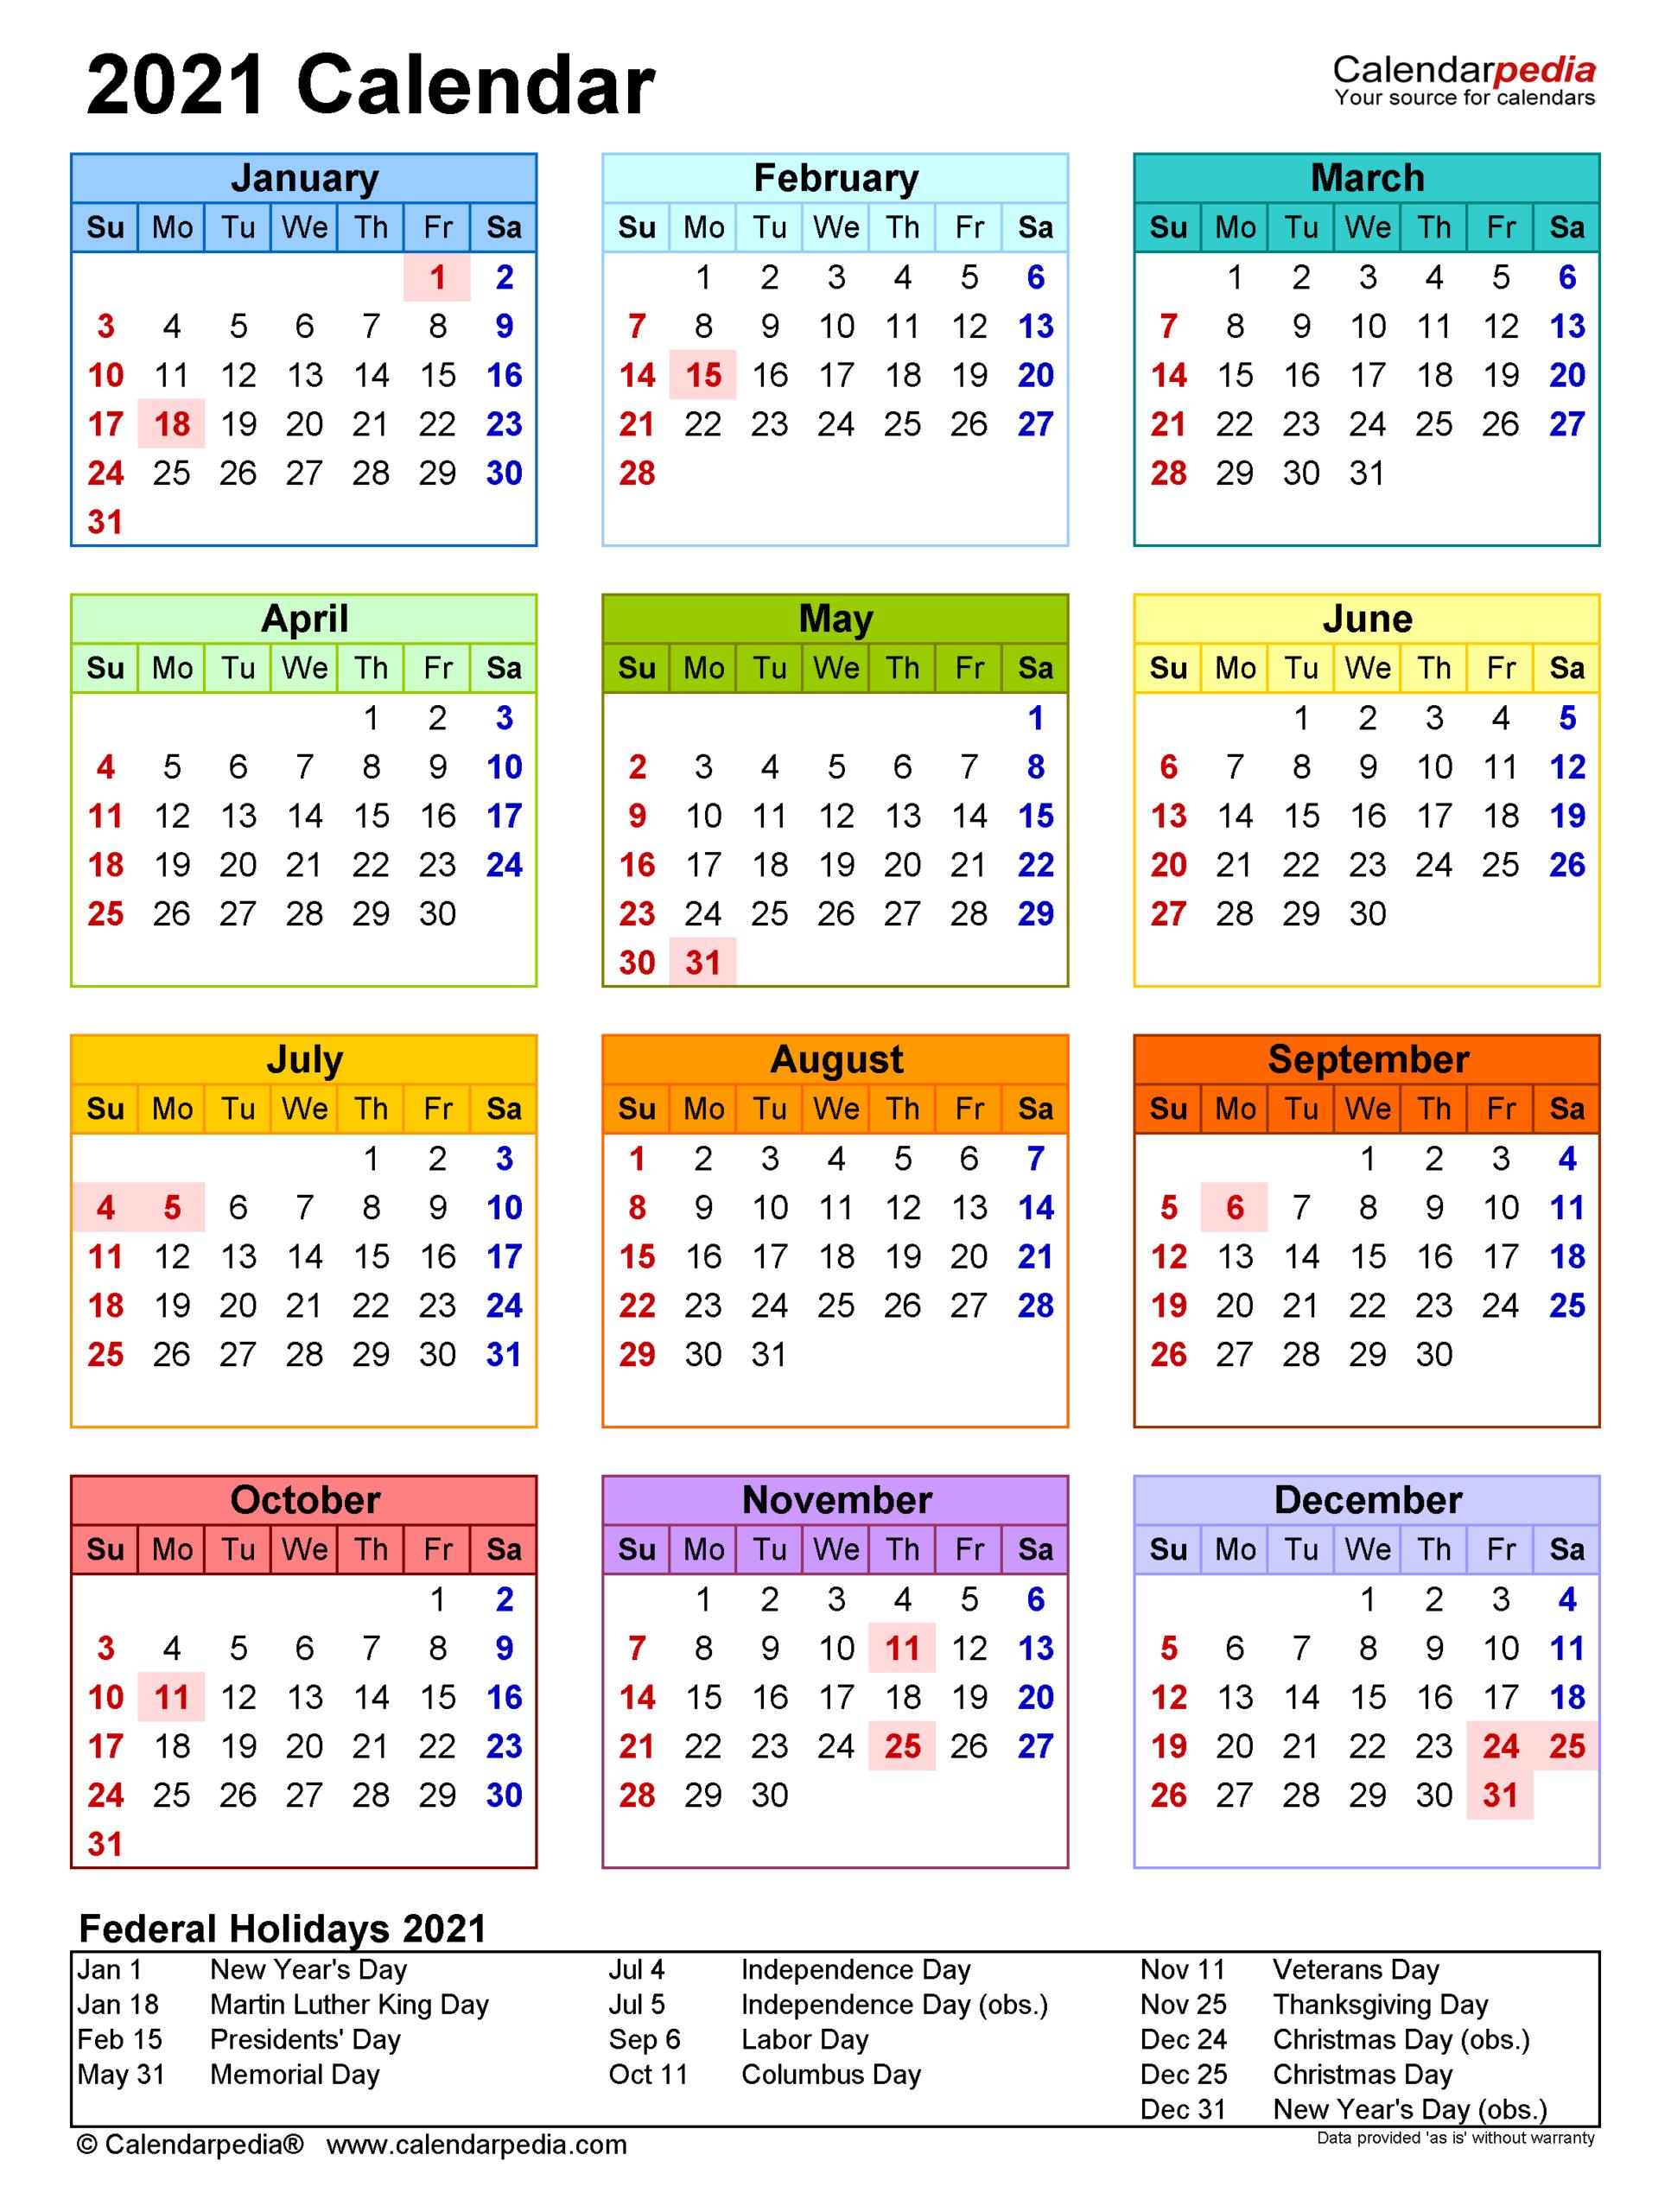 2021 Calendar - Free Printable Excel Templates - Calendarpedia intended for Federal Government Calendar 2021 Printable